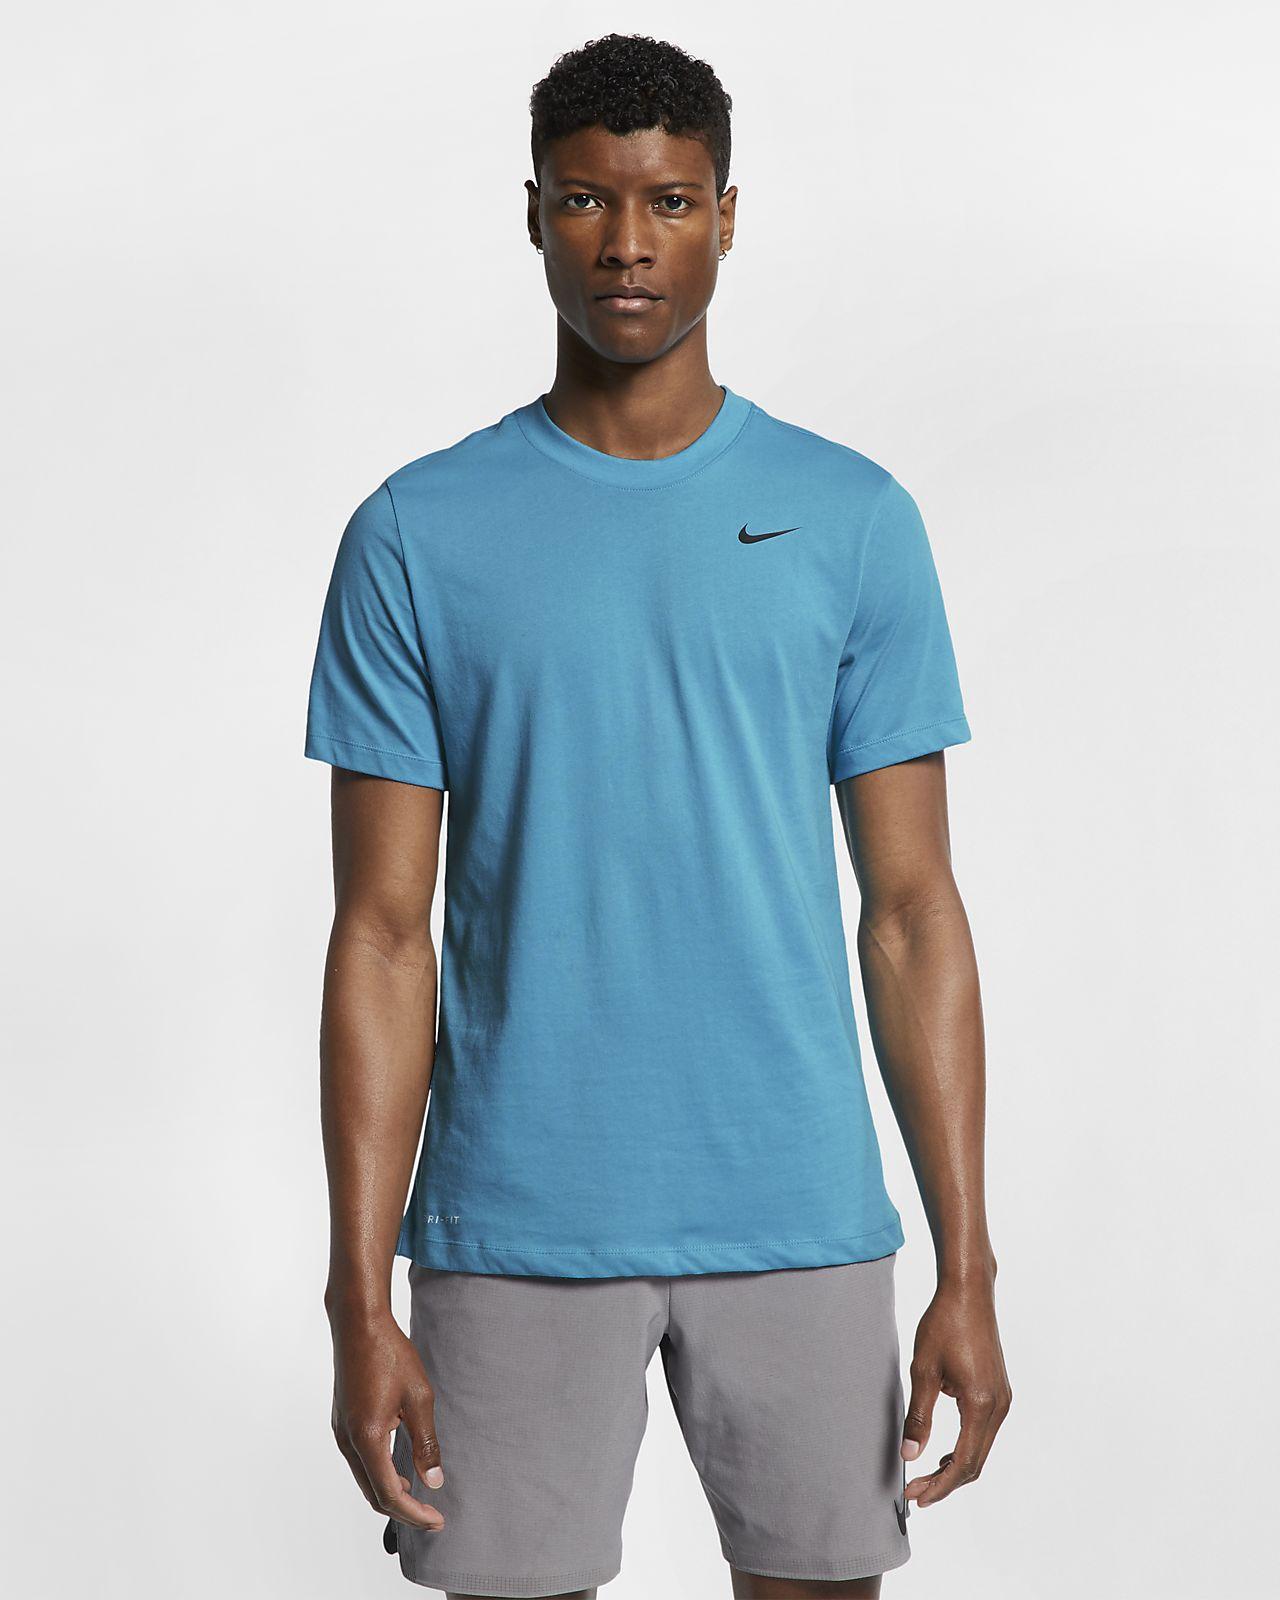 T-shirt da training Nike Dri-FIT - Uomo